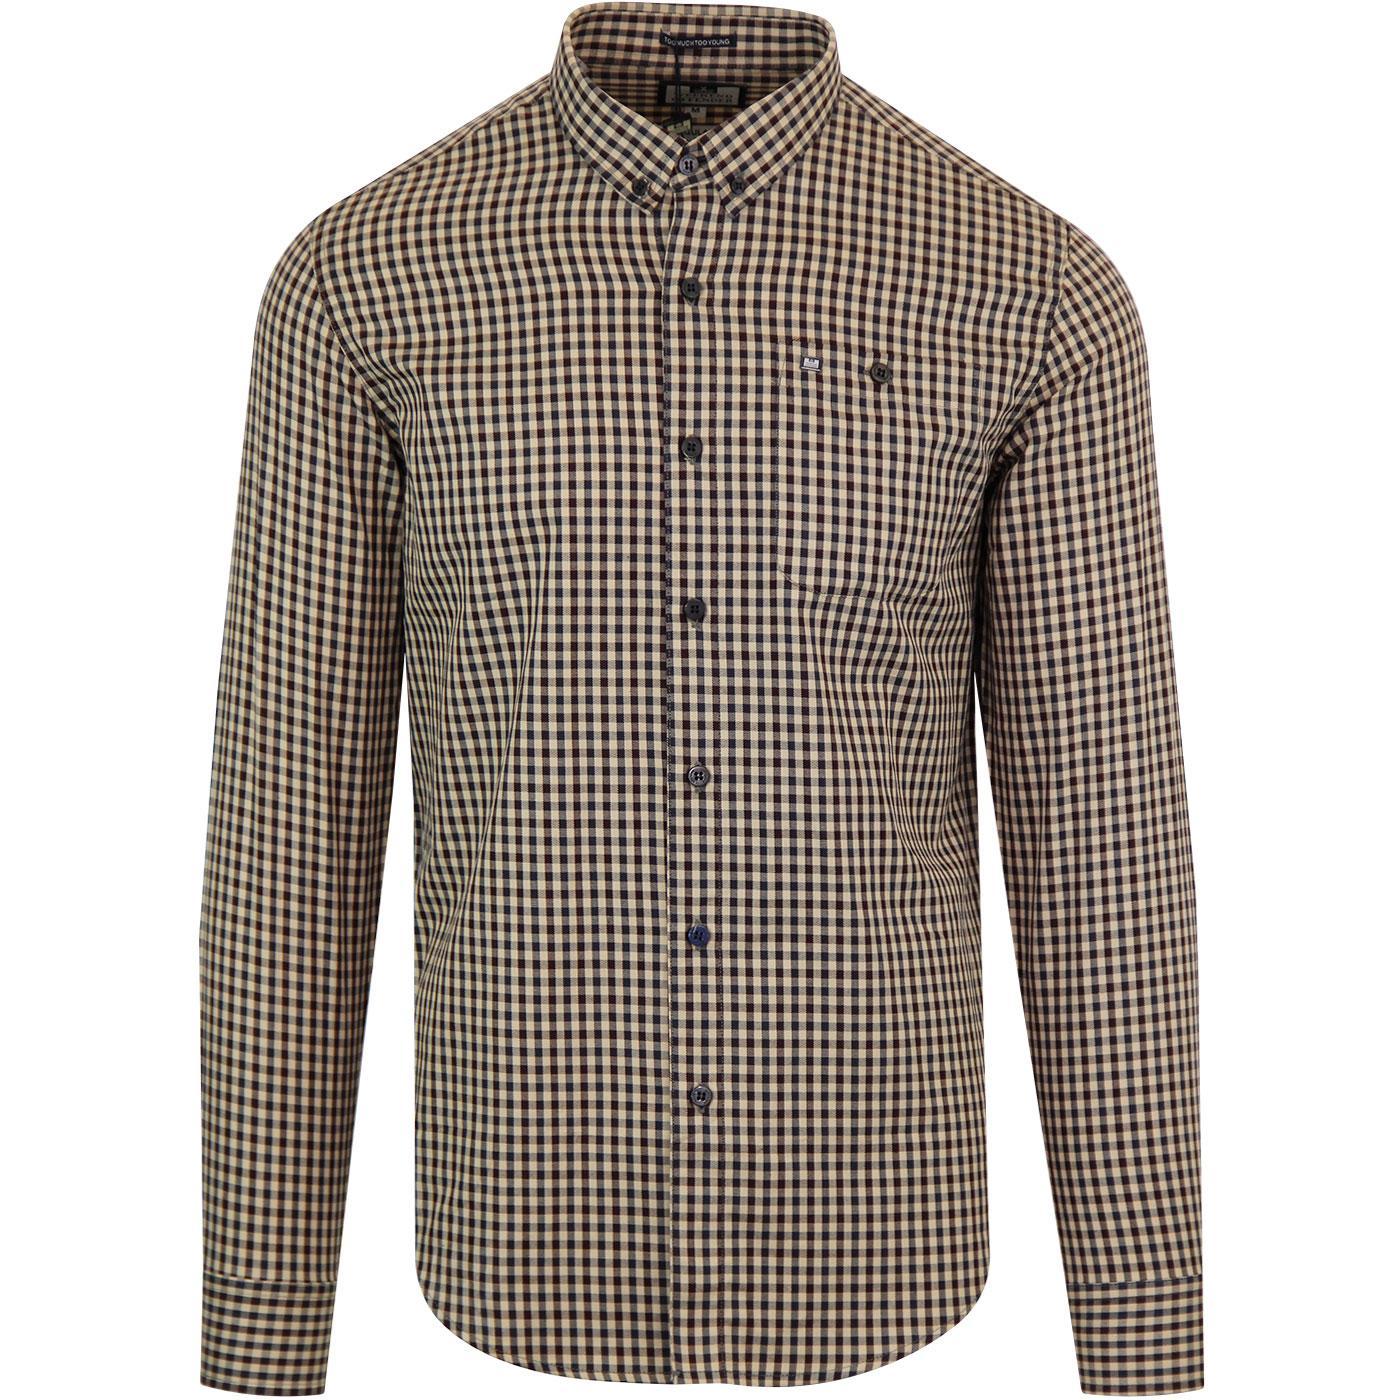 Wilde WEEKEND OFFENDER Heritage Check Mod Shirt